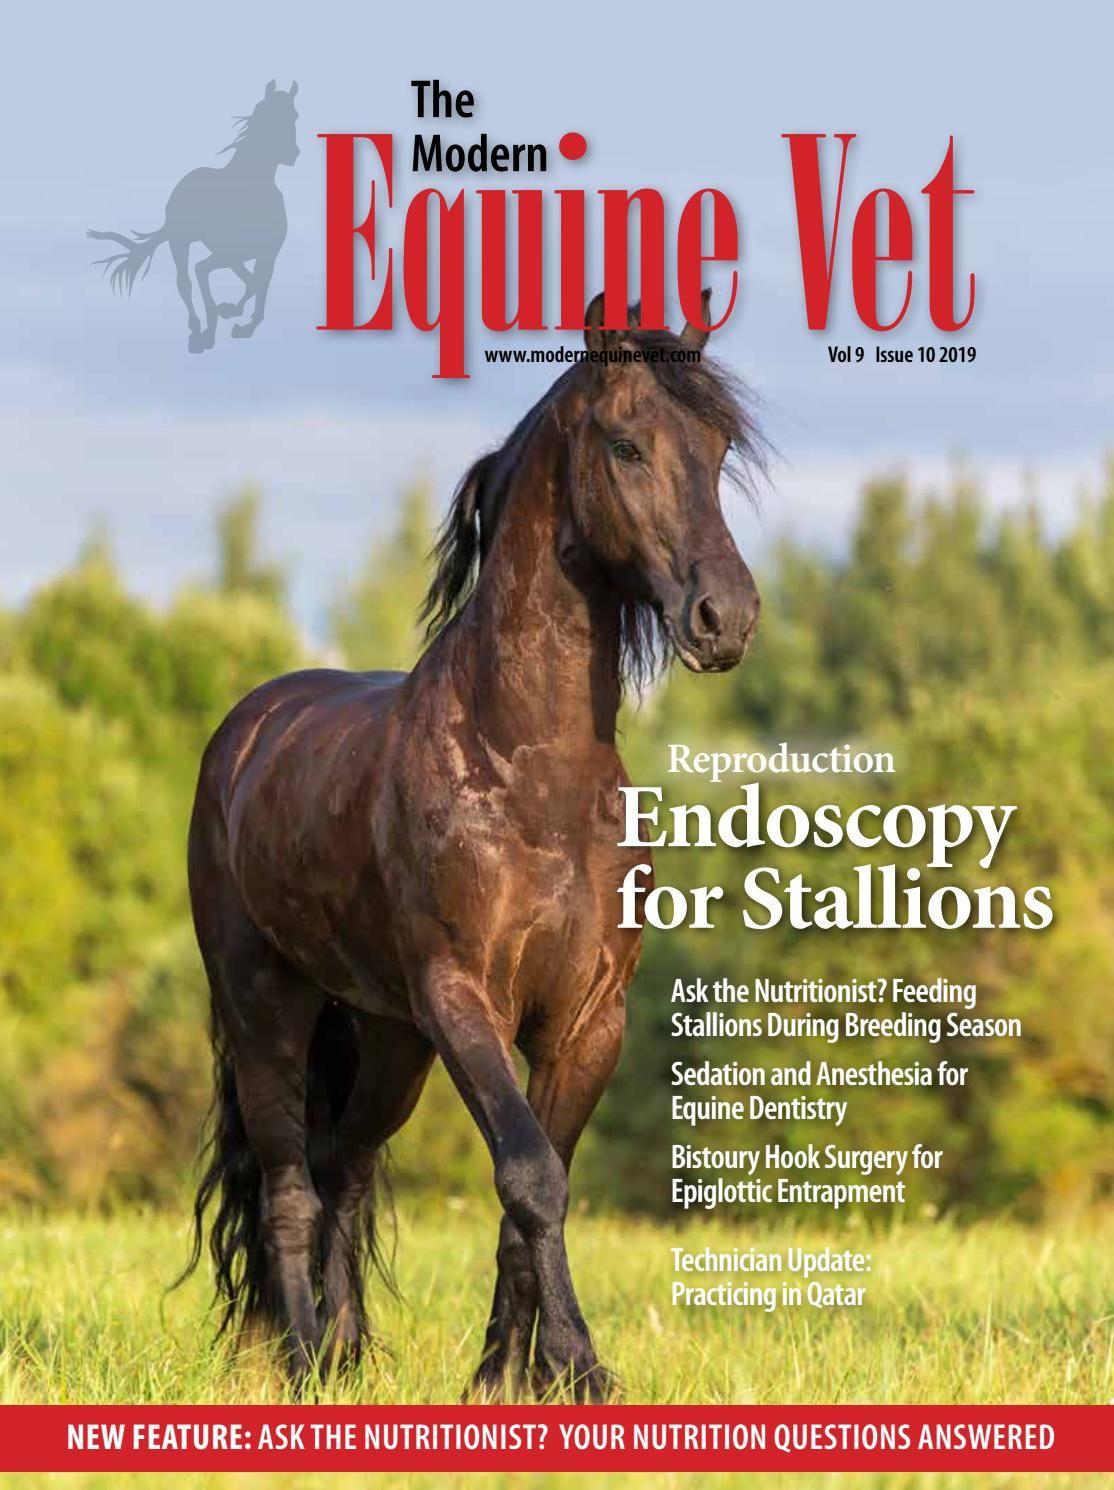 The Modern Equine Vet October 2019 Equines Vets Sedation